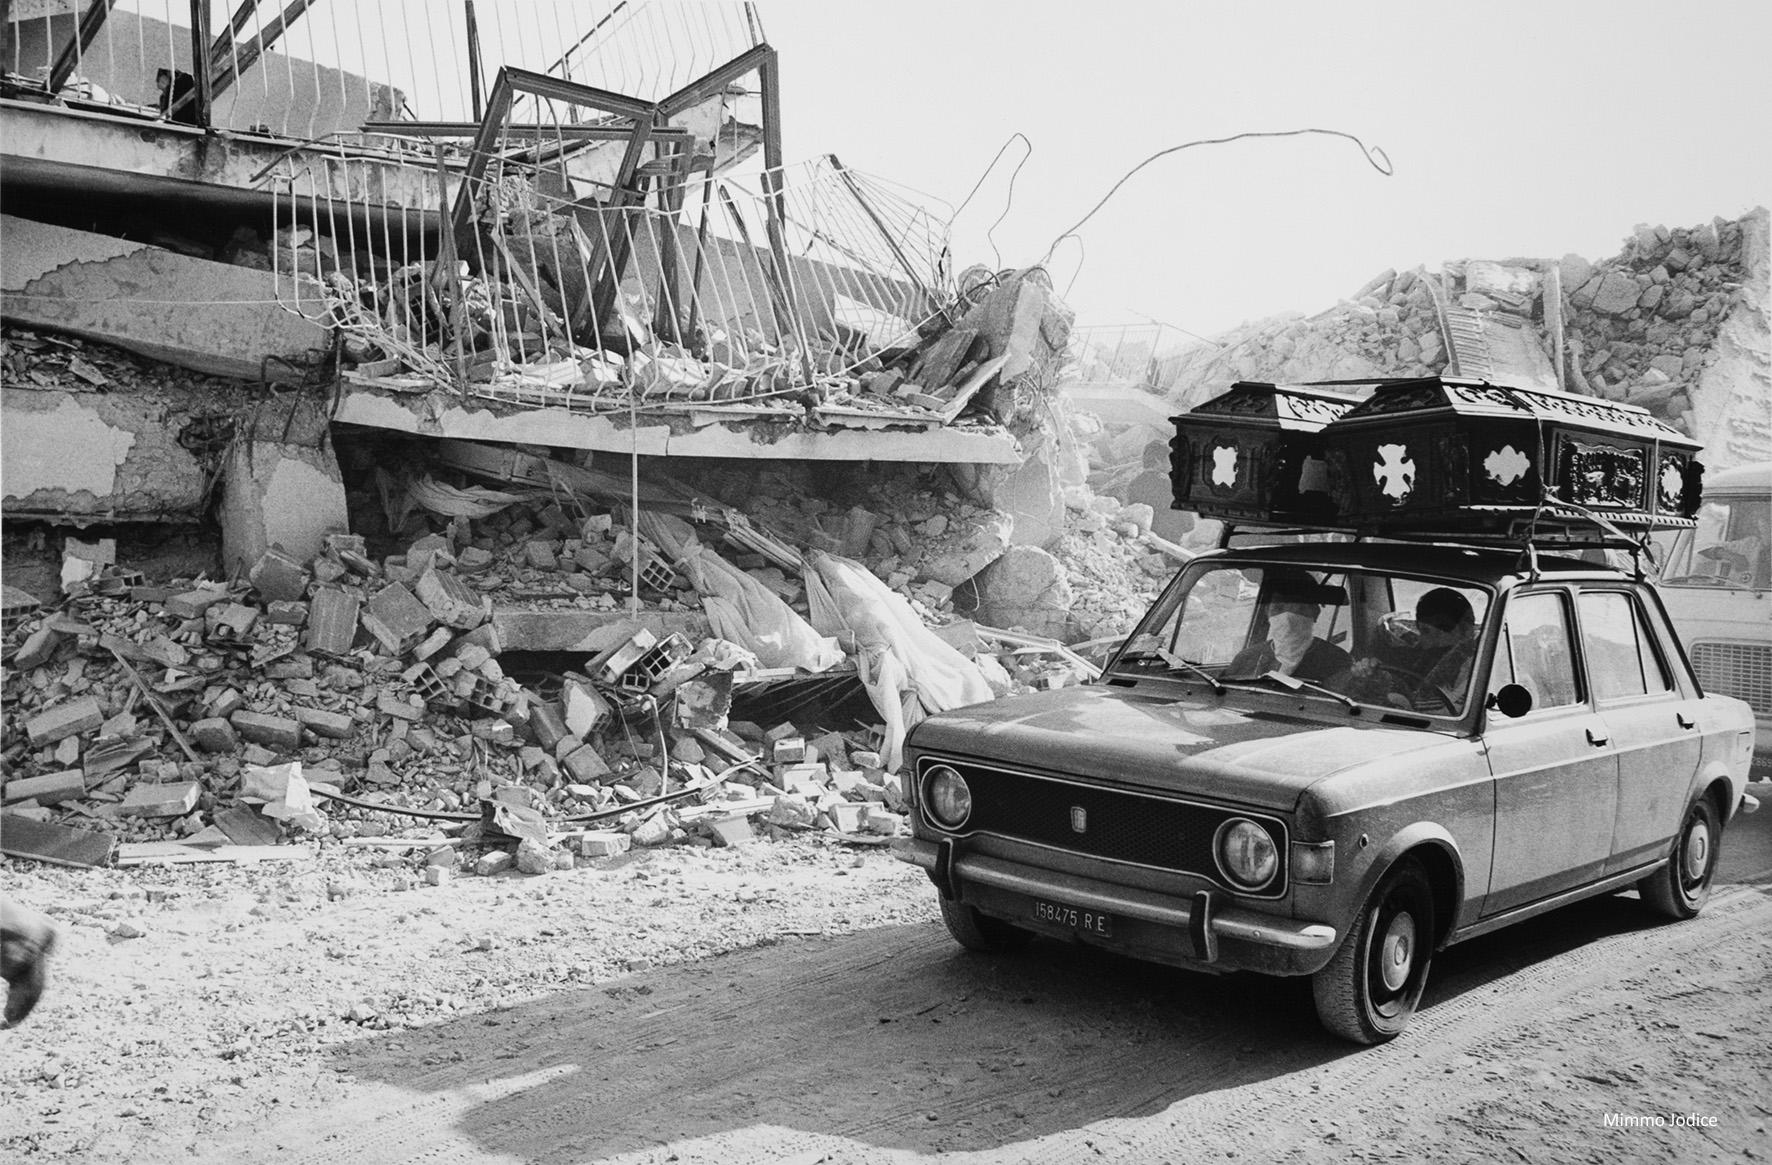 12 Mimmo Jodice Lioni 1980 1jpg